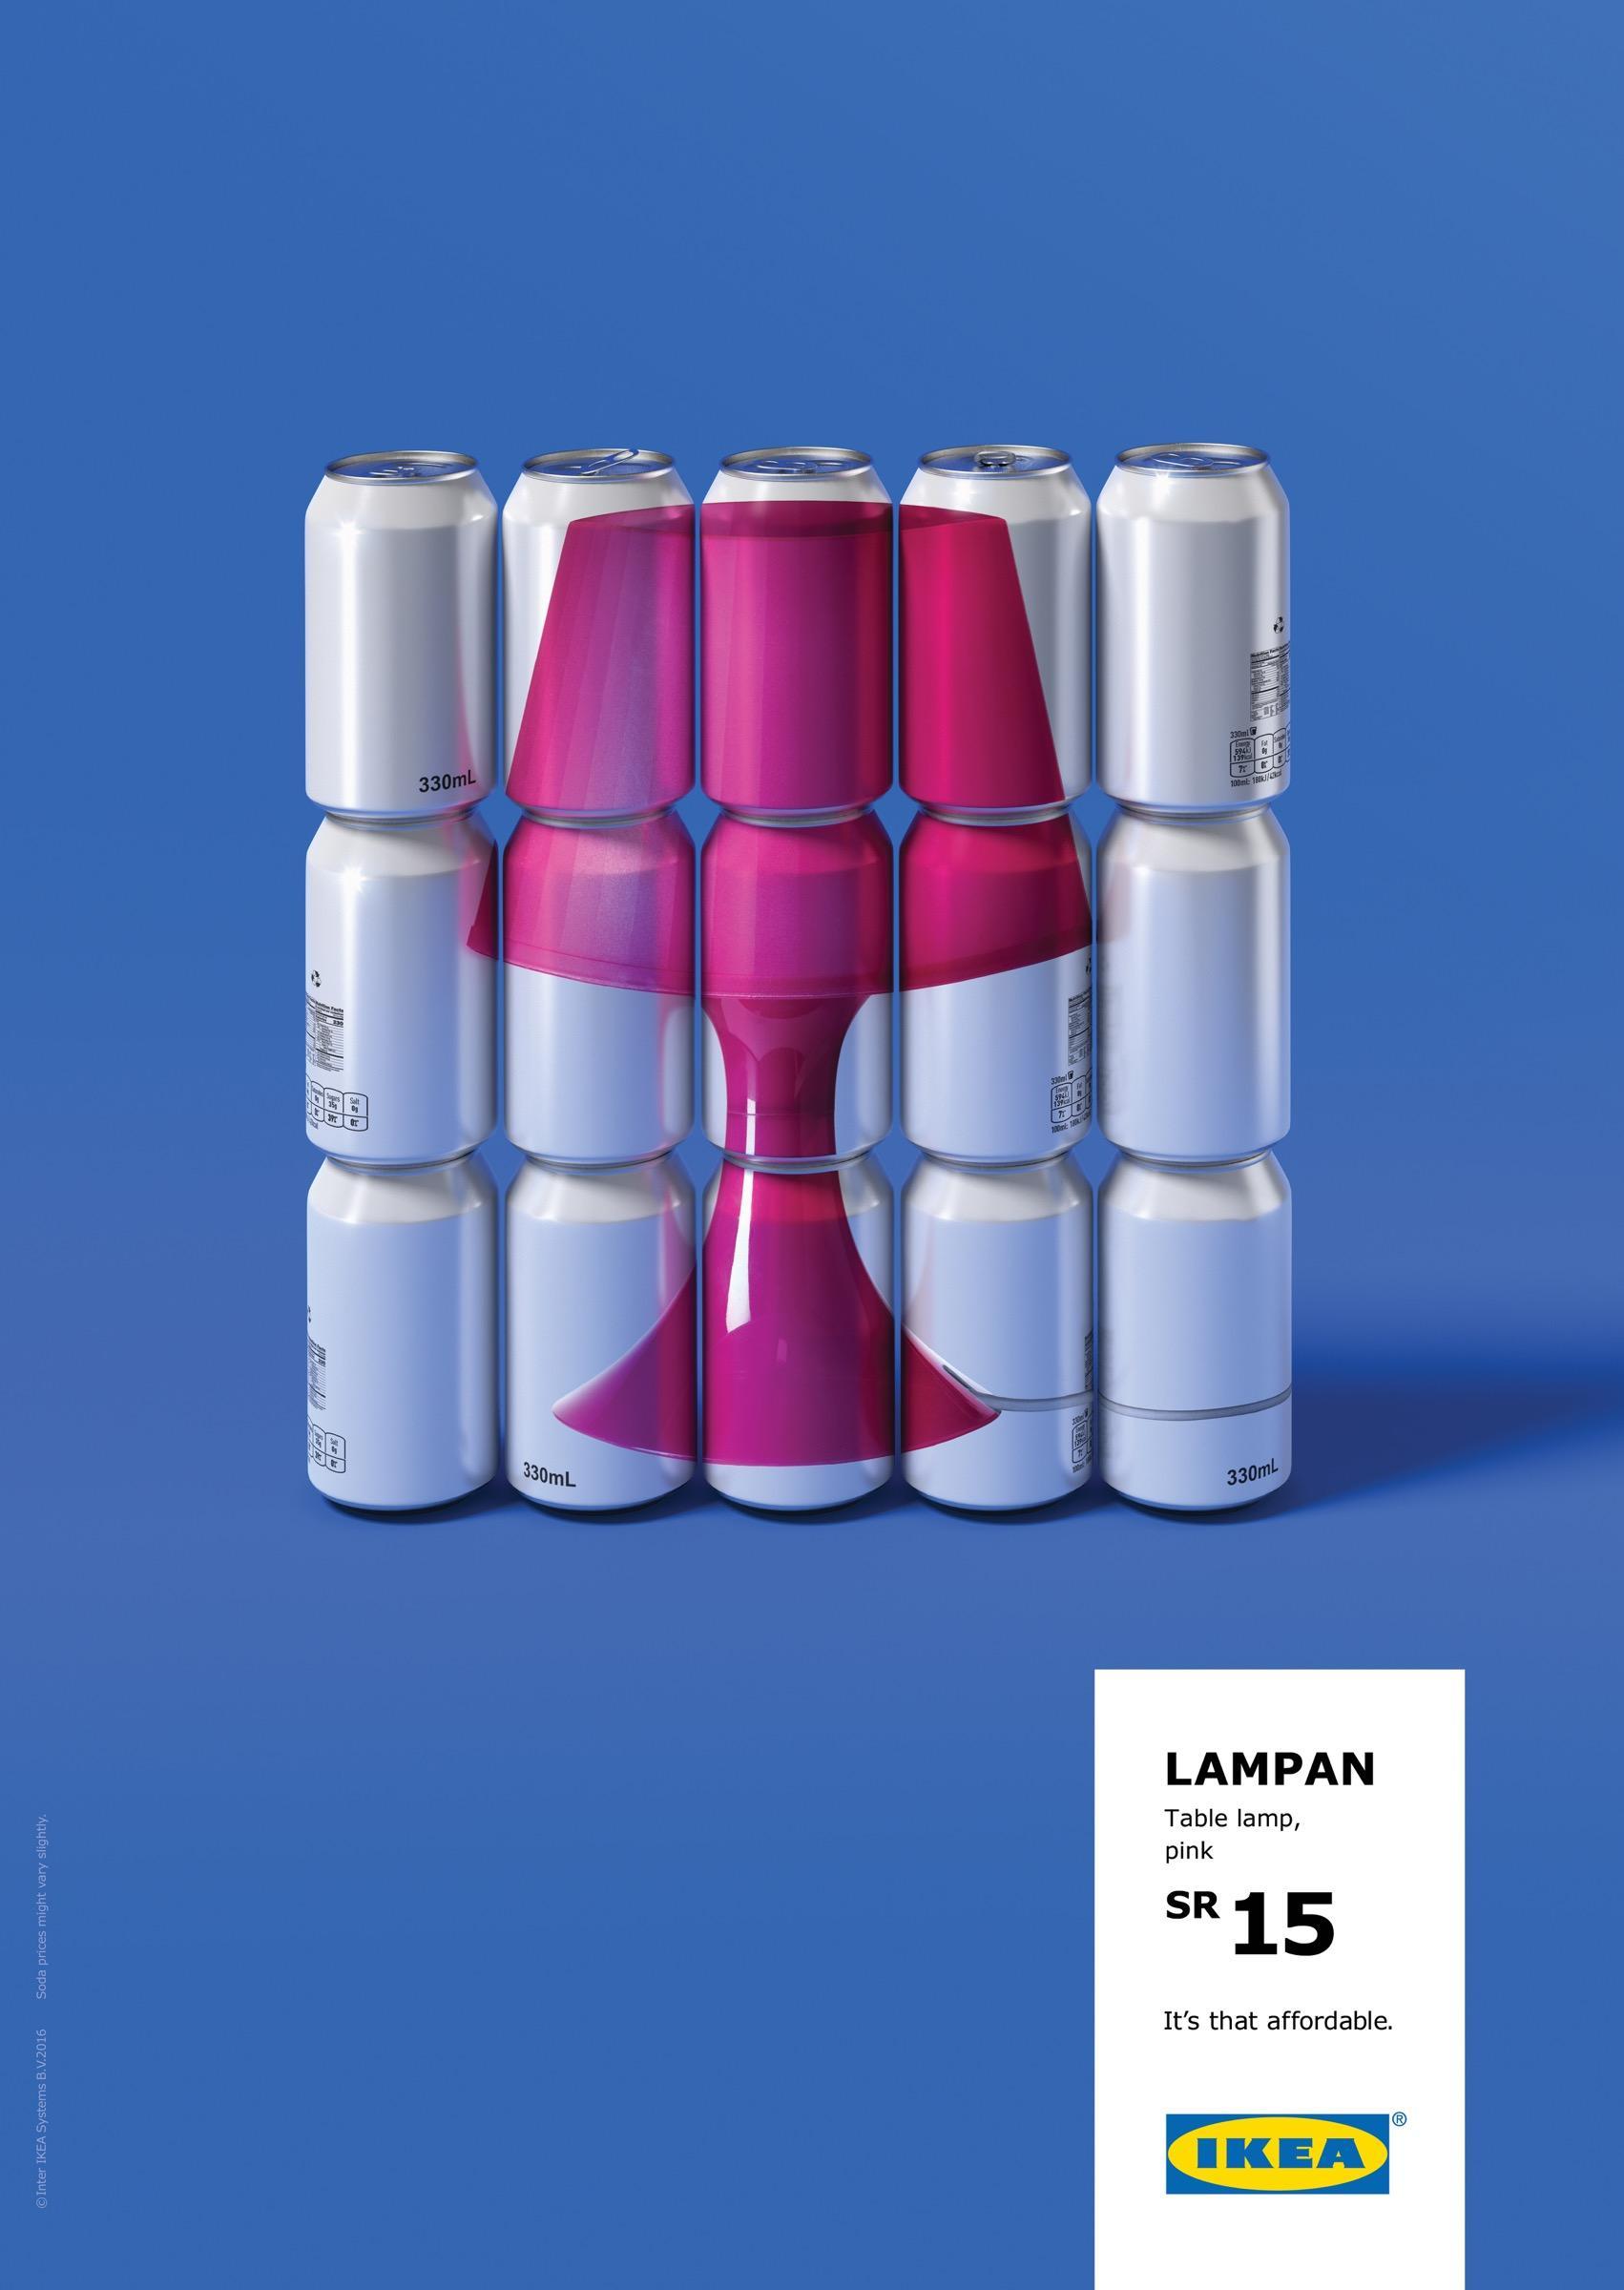 IKEA Print Ad - Lamp